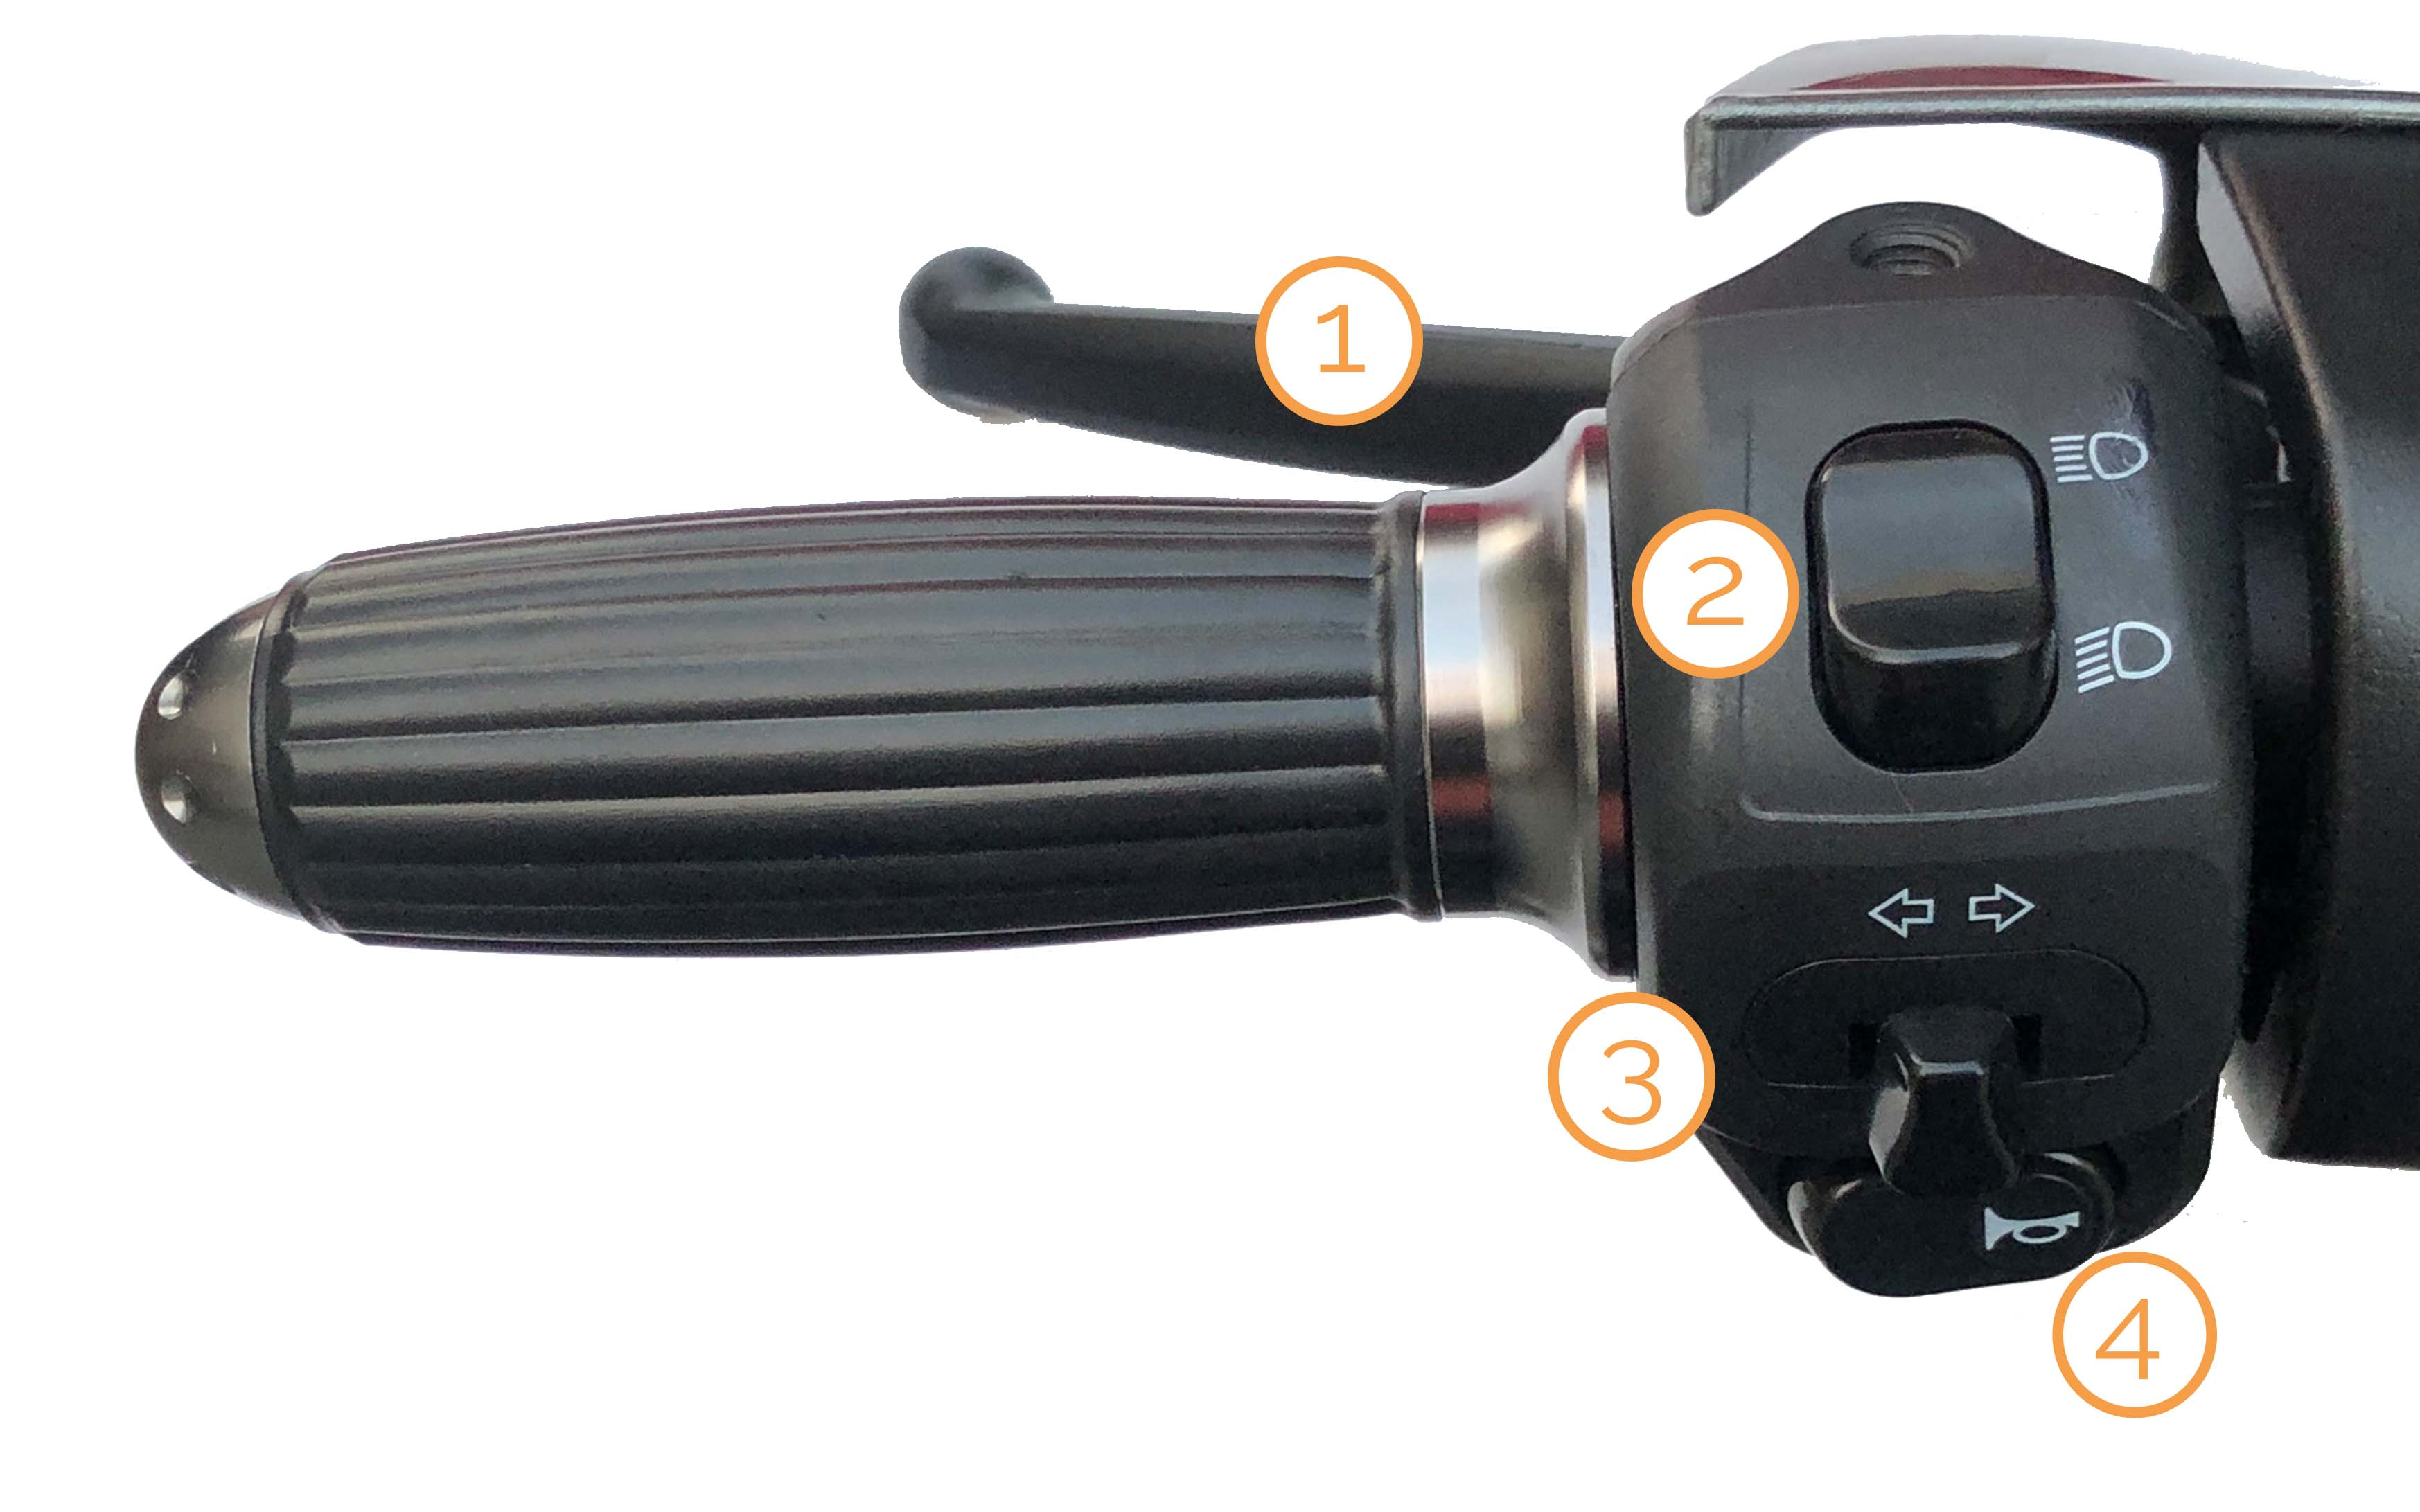 Linker Griff mit Armaturen des Bendi Standard Dreirad Elektromobil